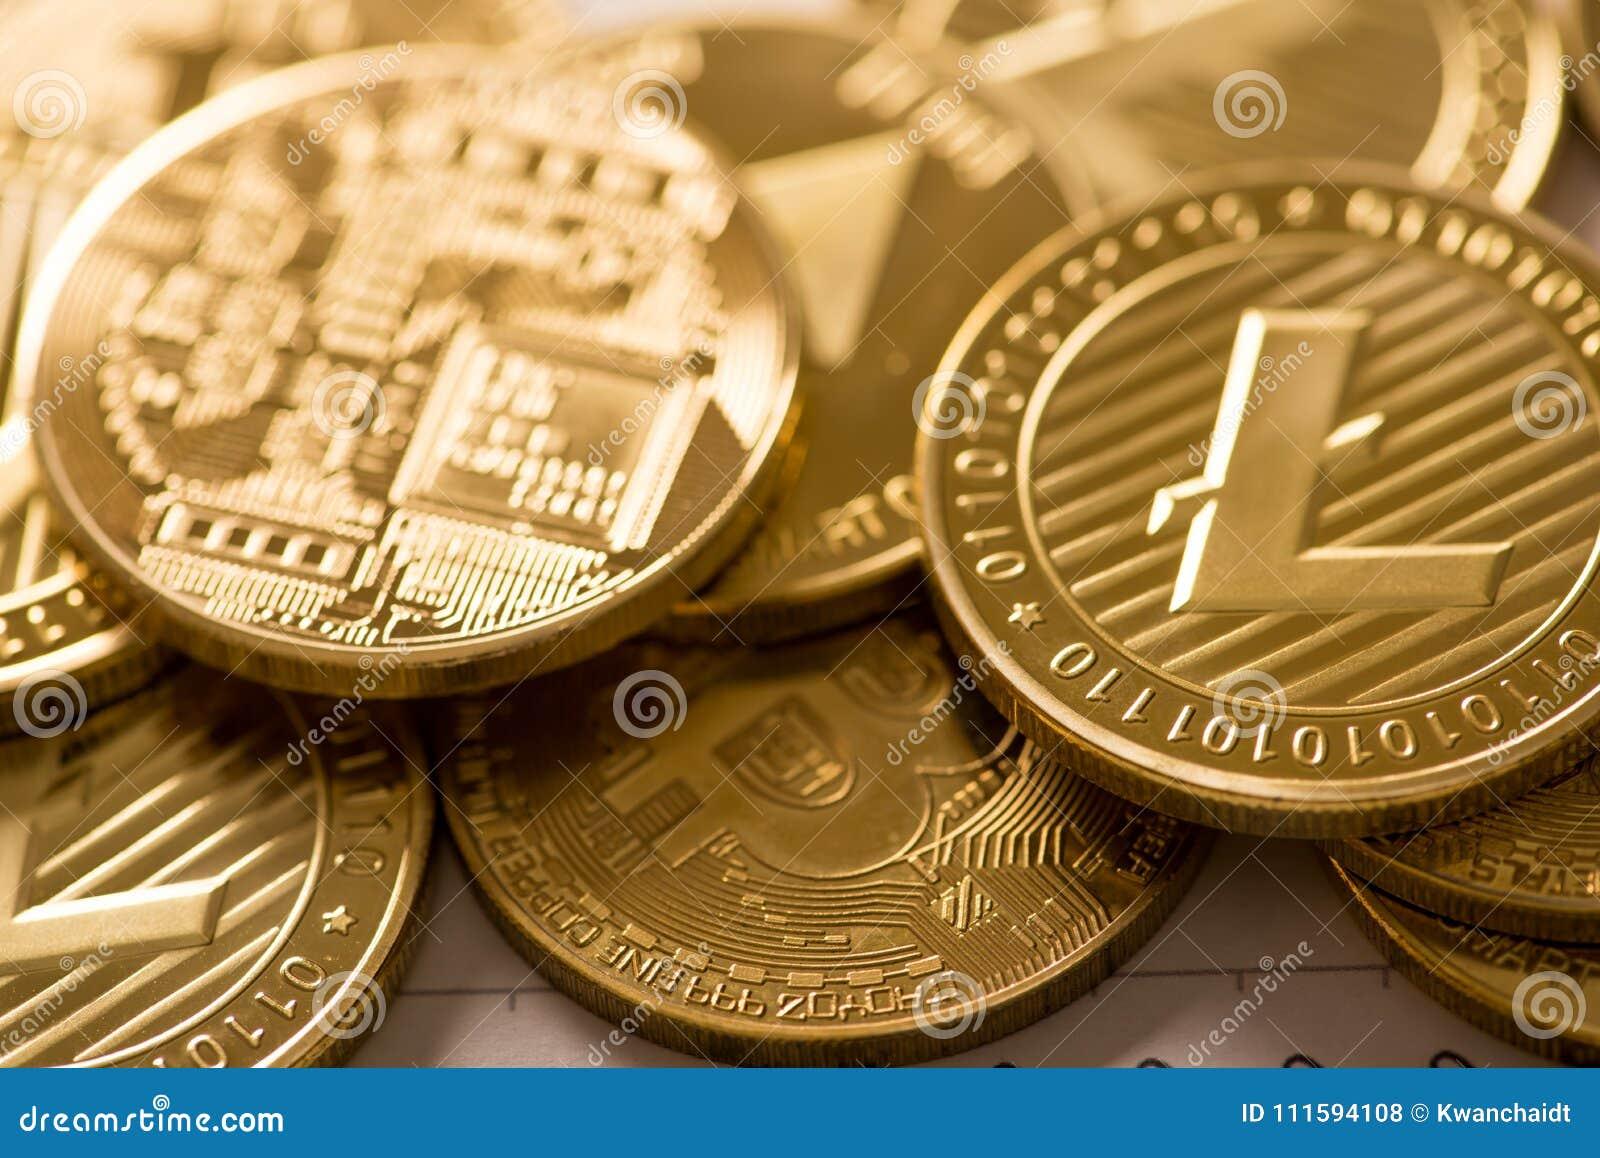 bitcoin ethereum litecoin exchange